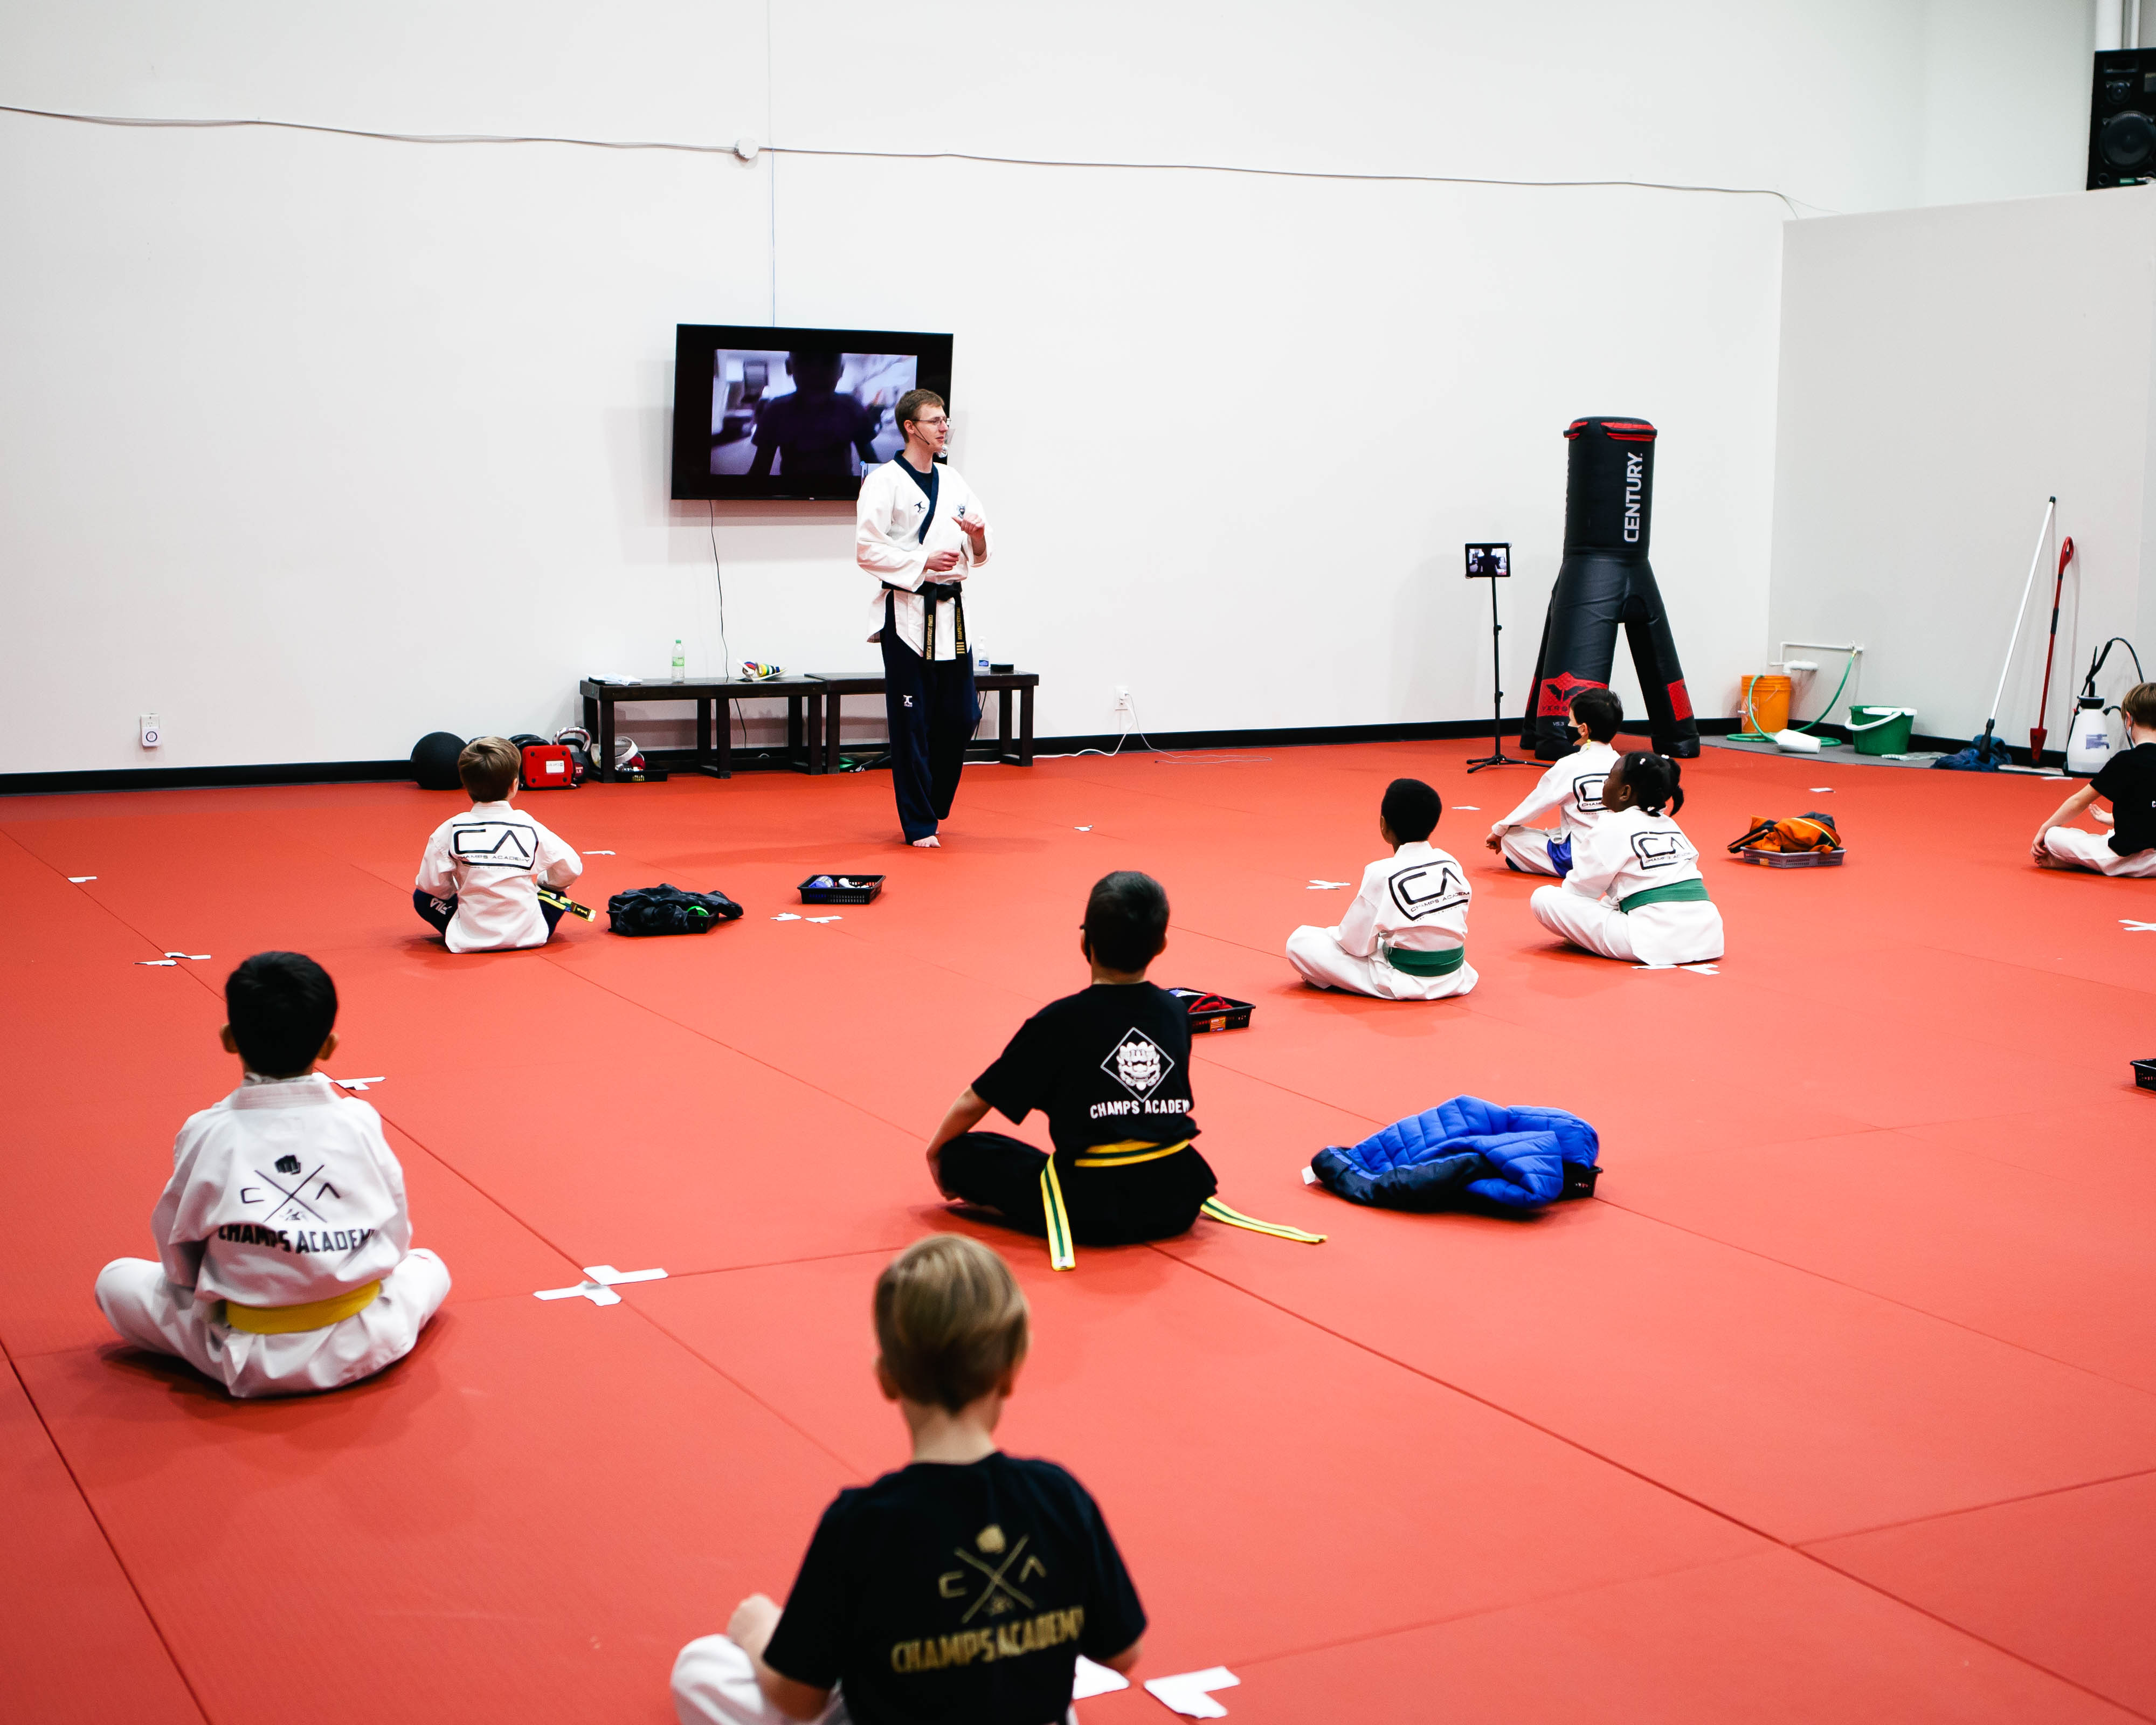 Taekwondo instructor teaching a class